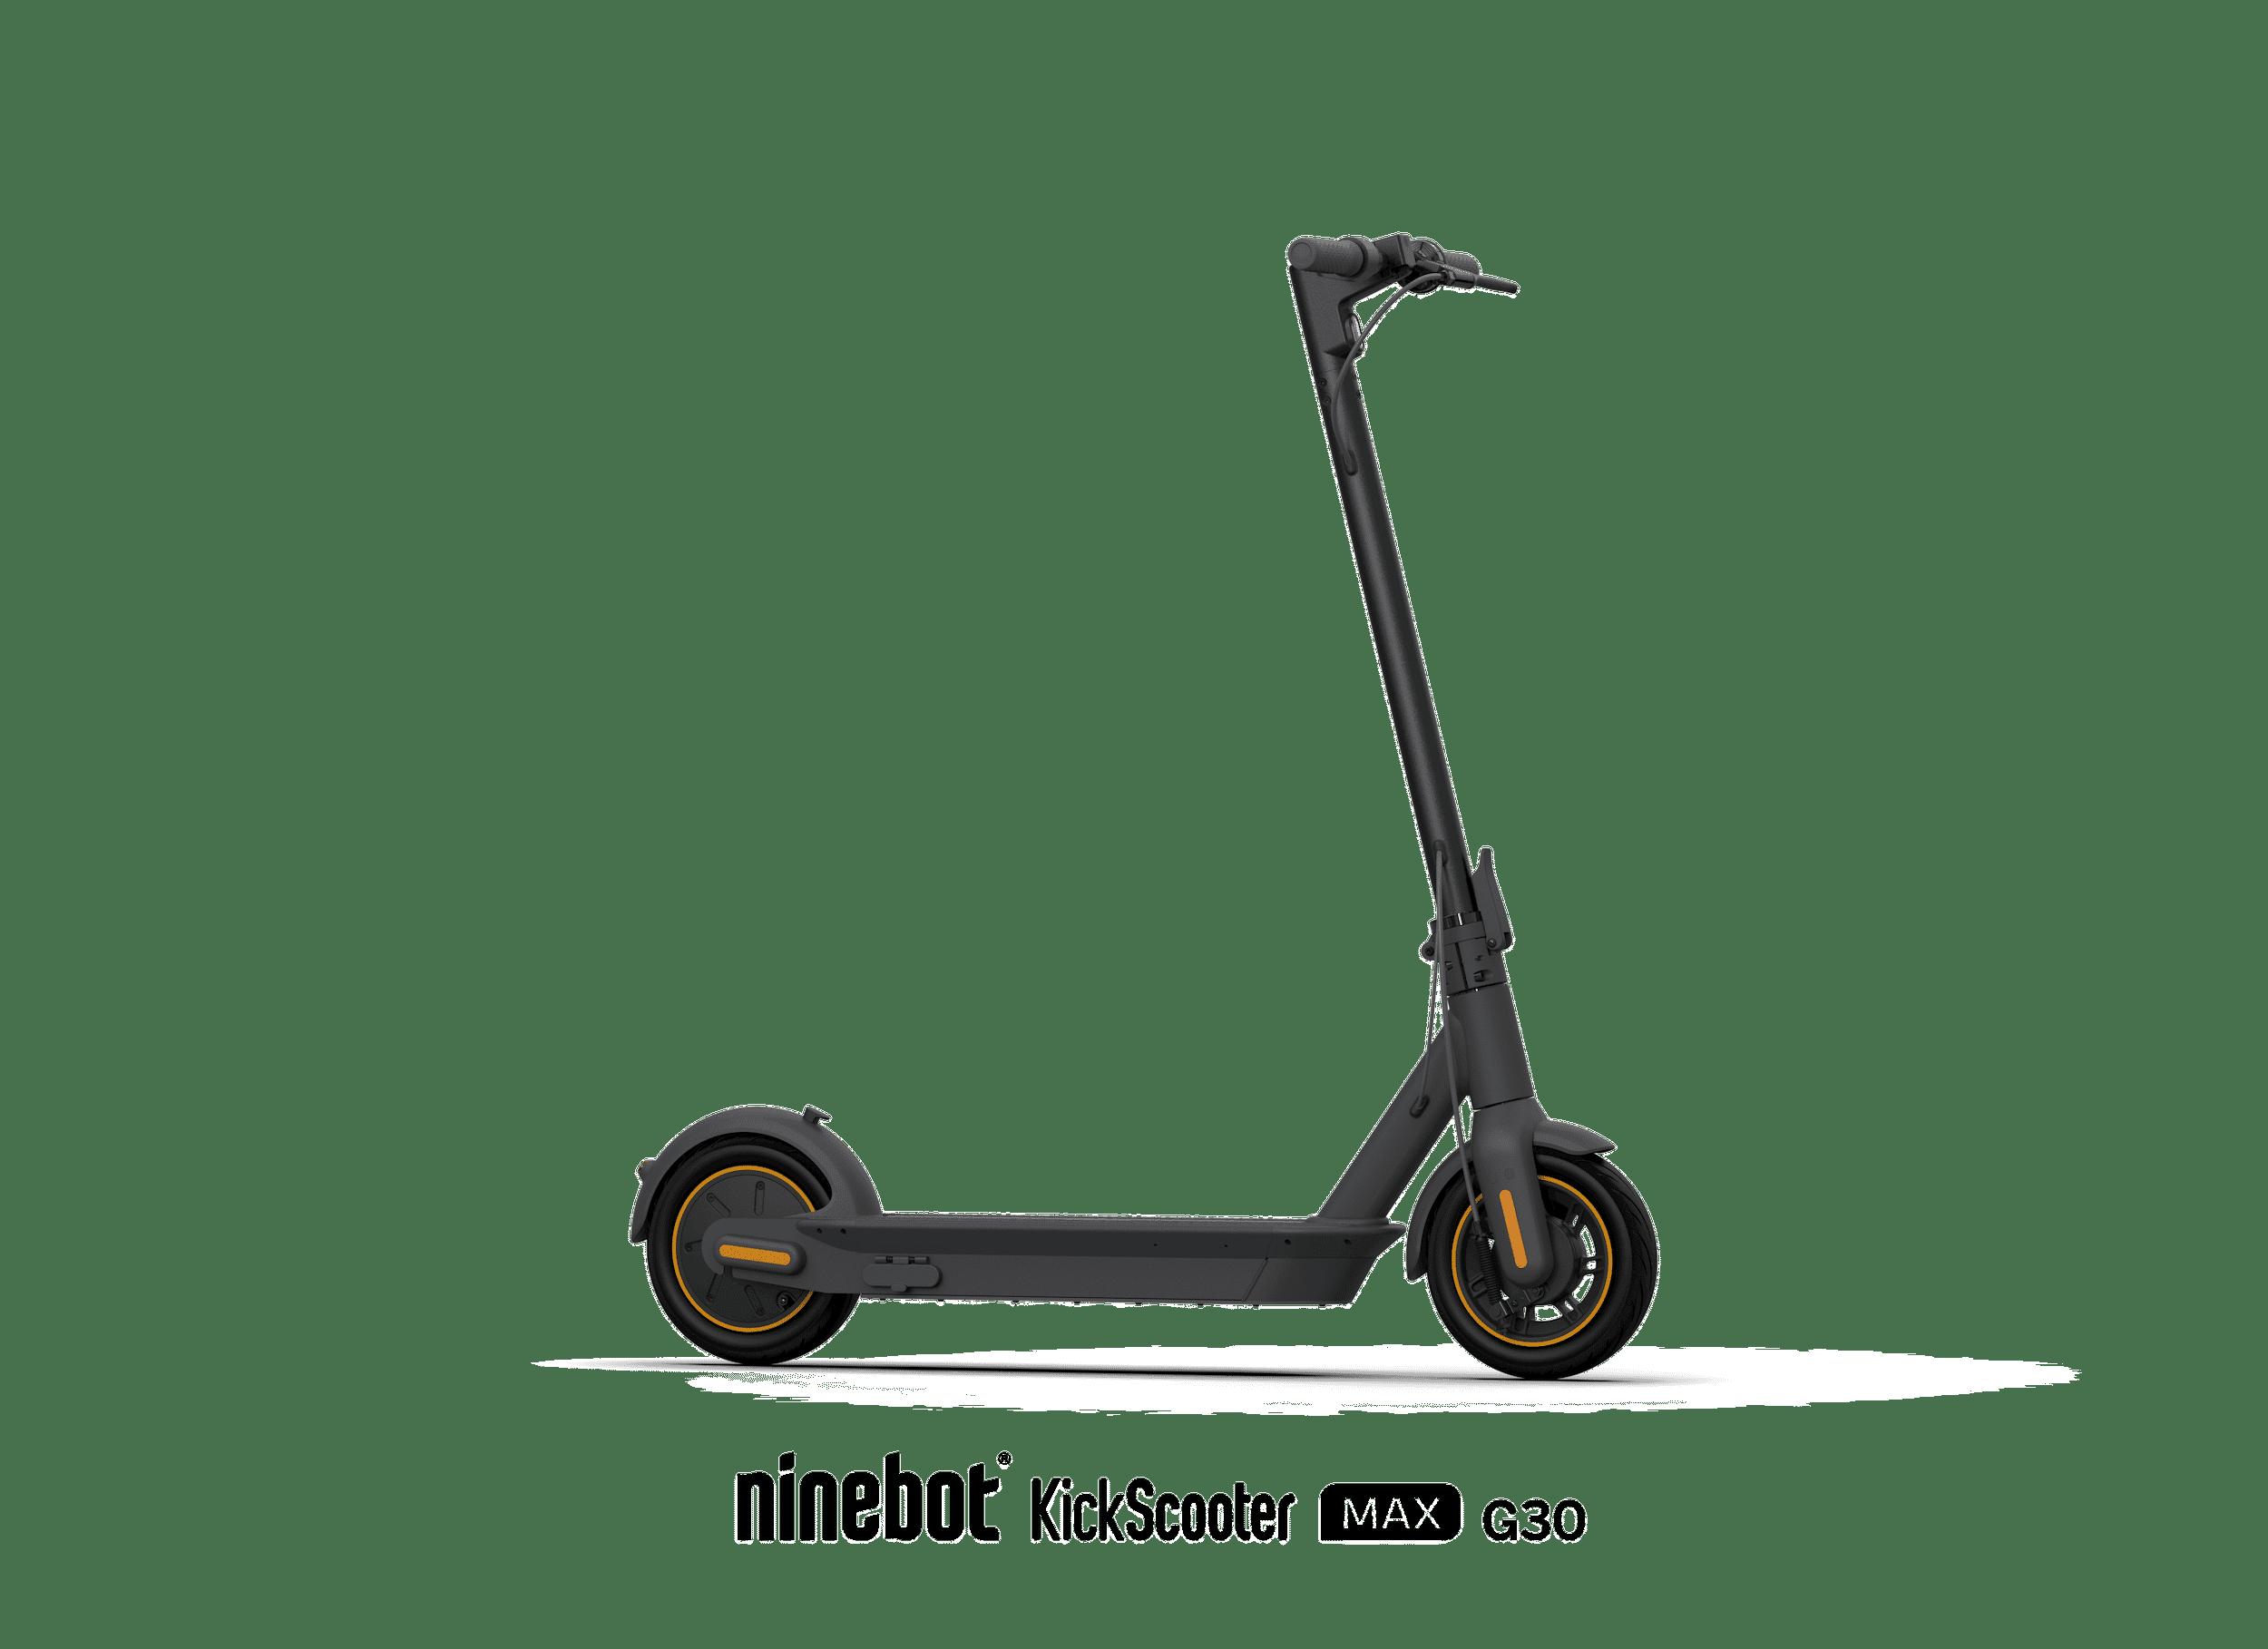 max g30 kick scooter